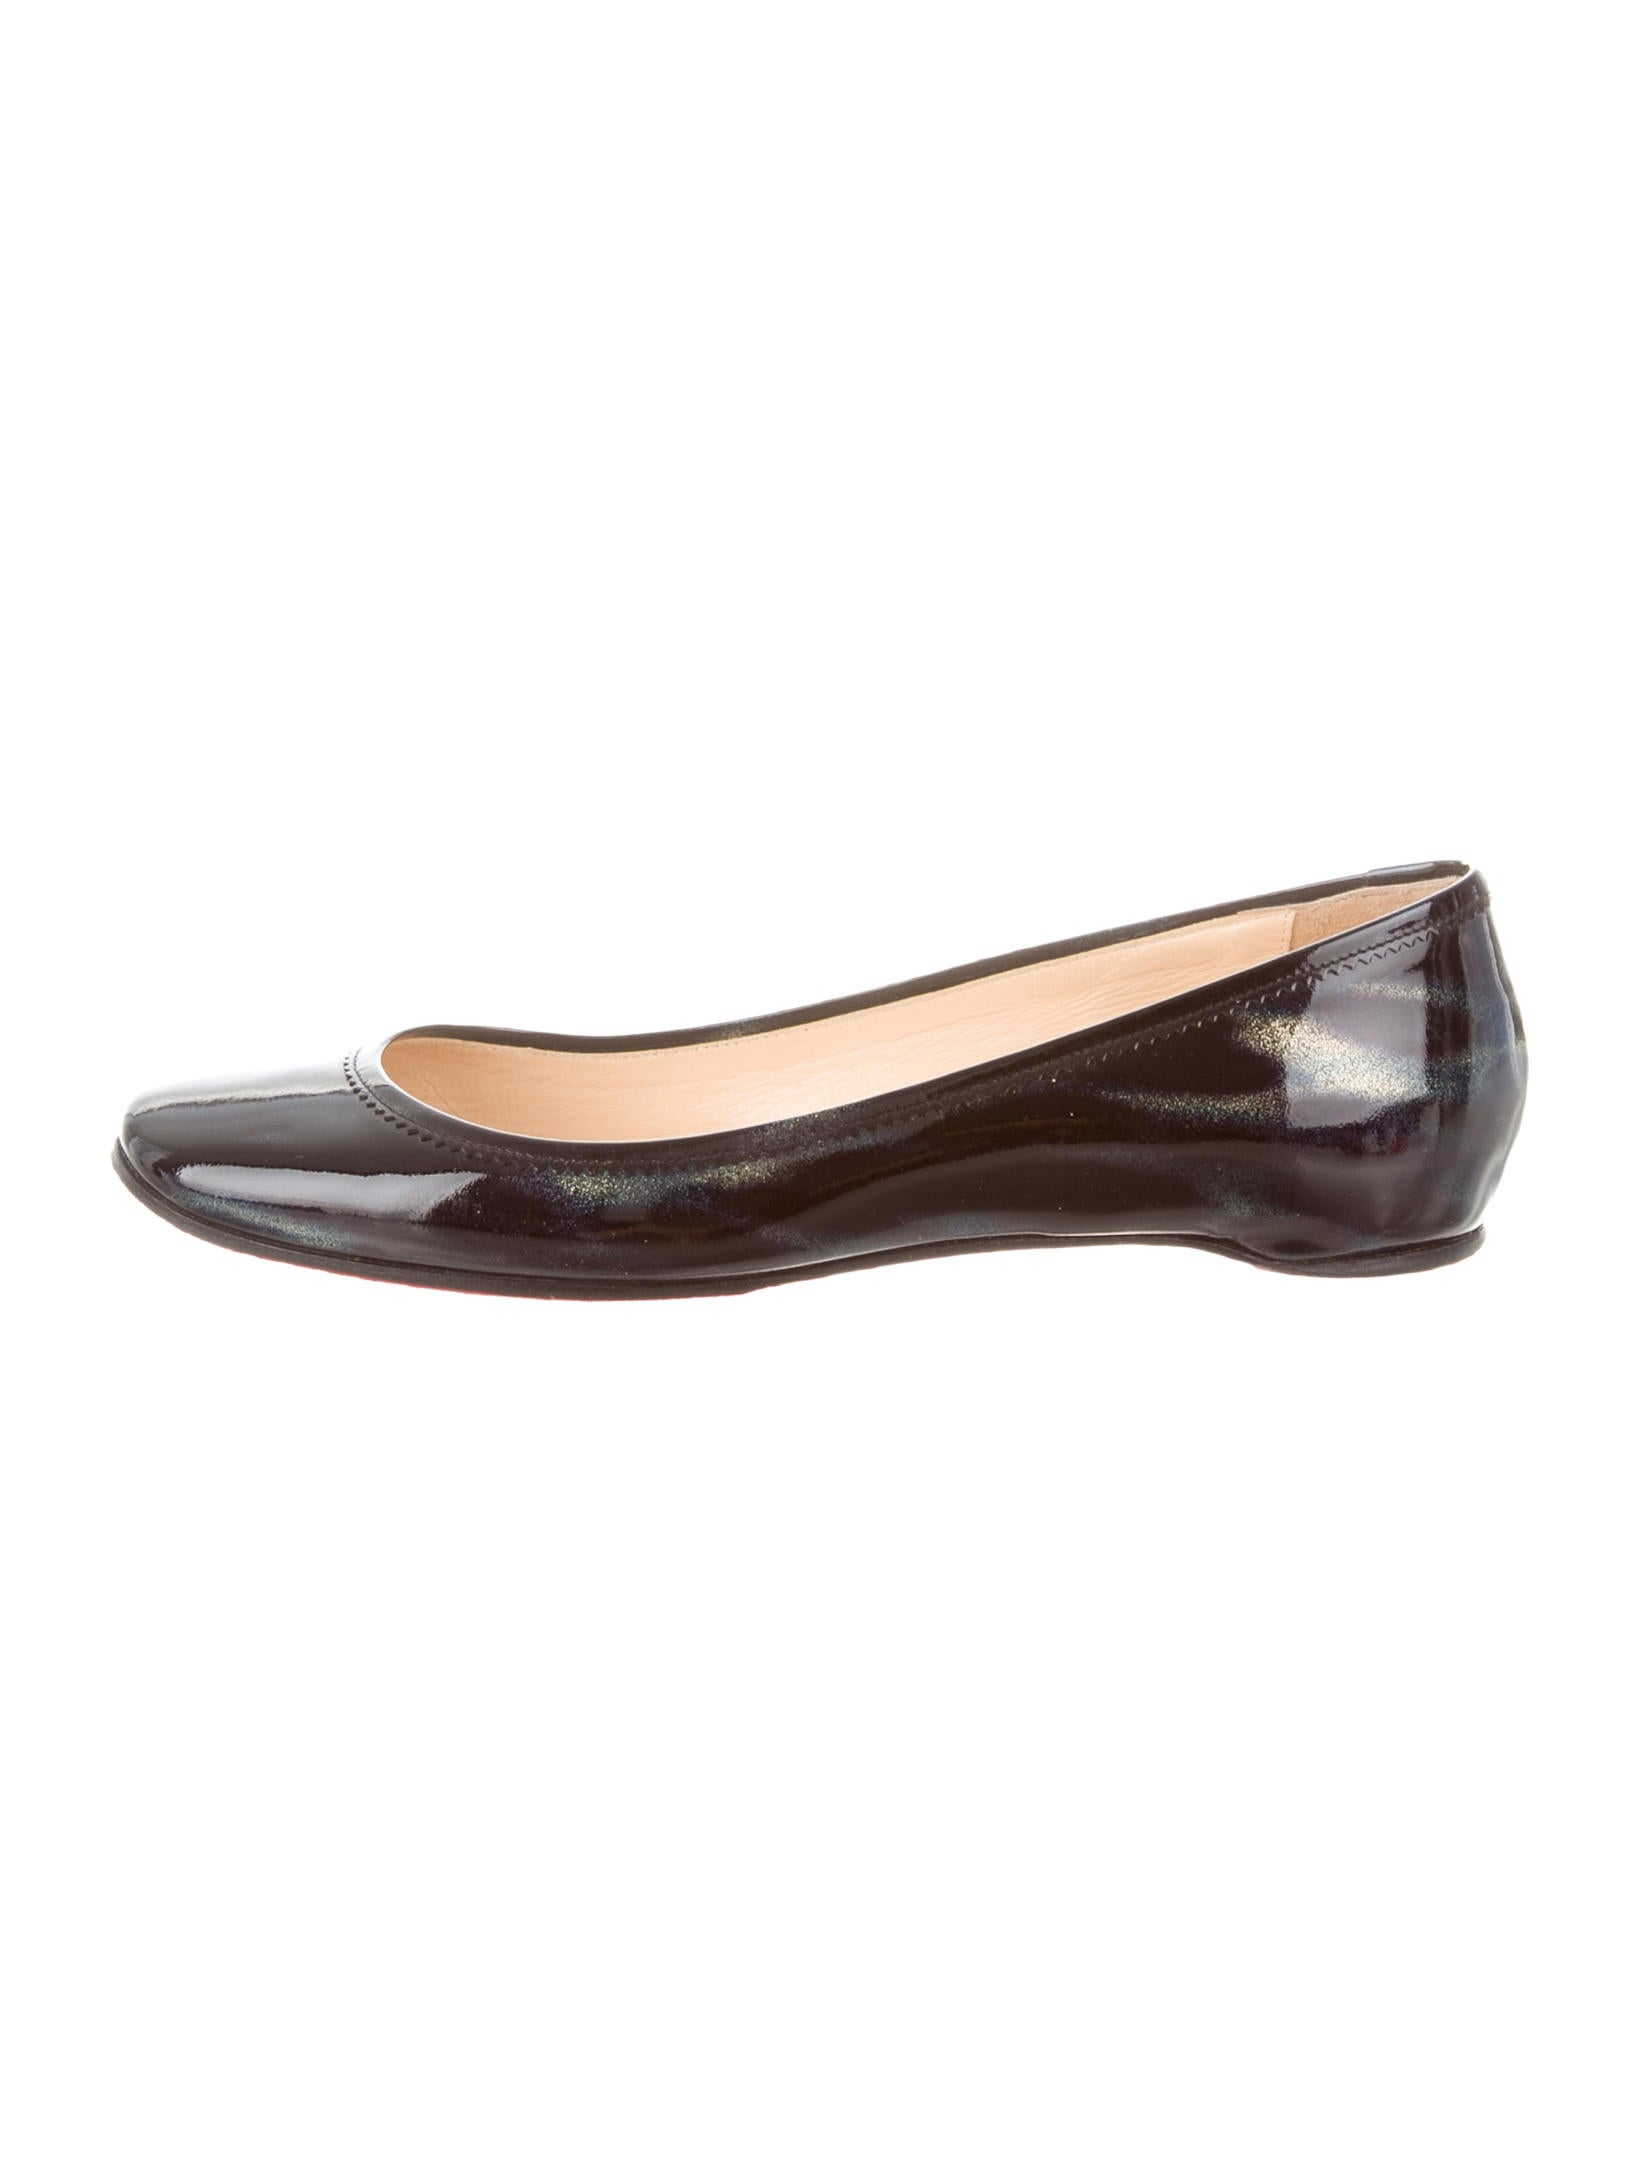 christian louboutin metallic patent leather flats shoes